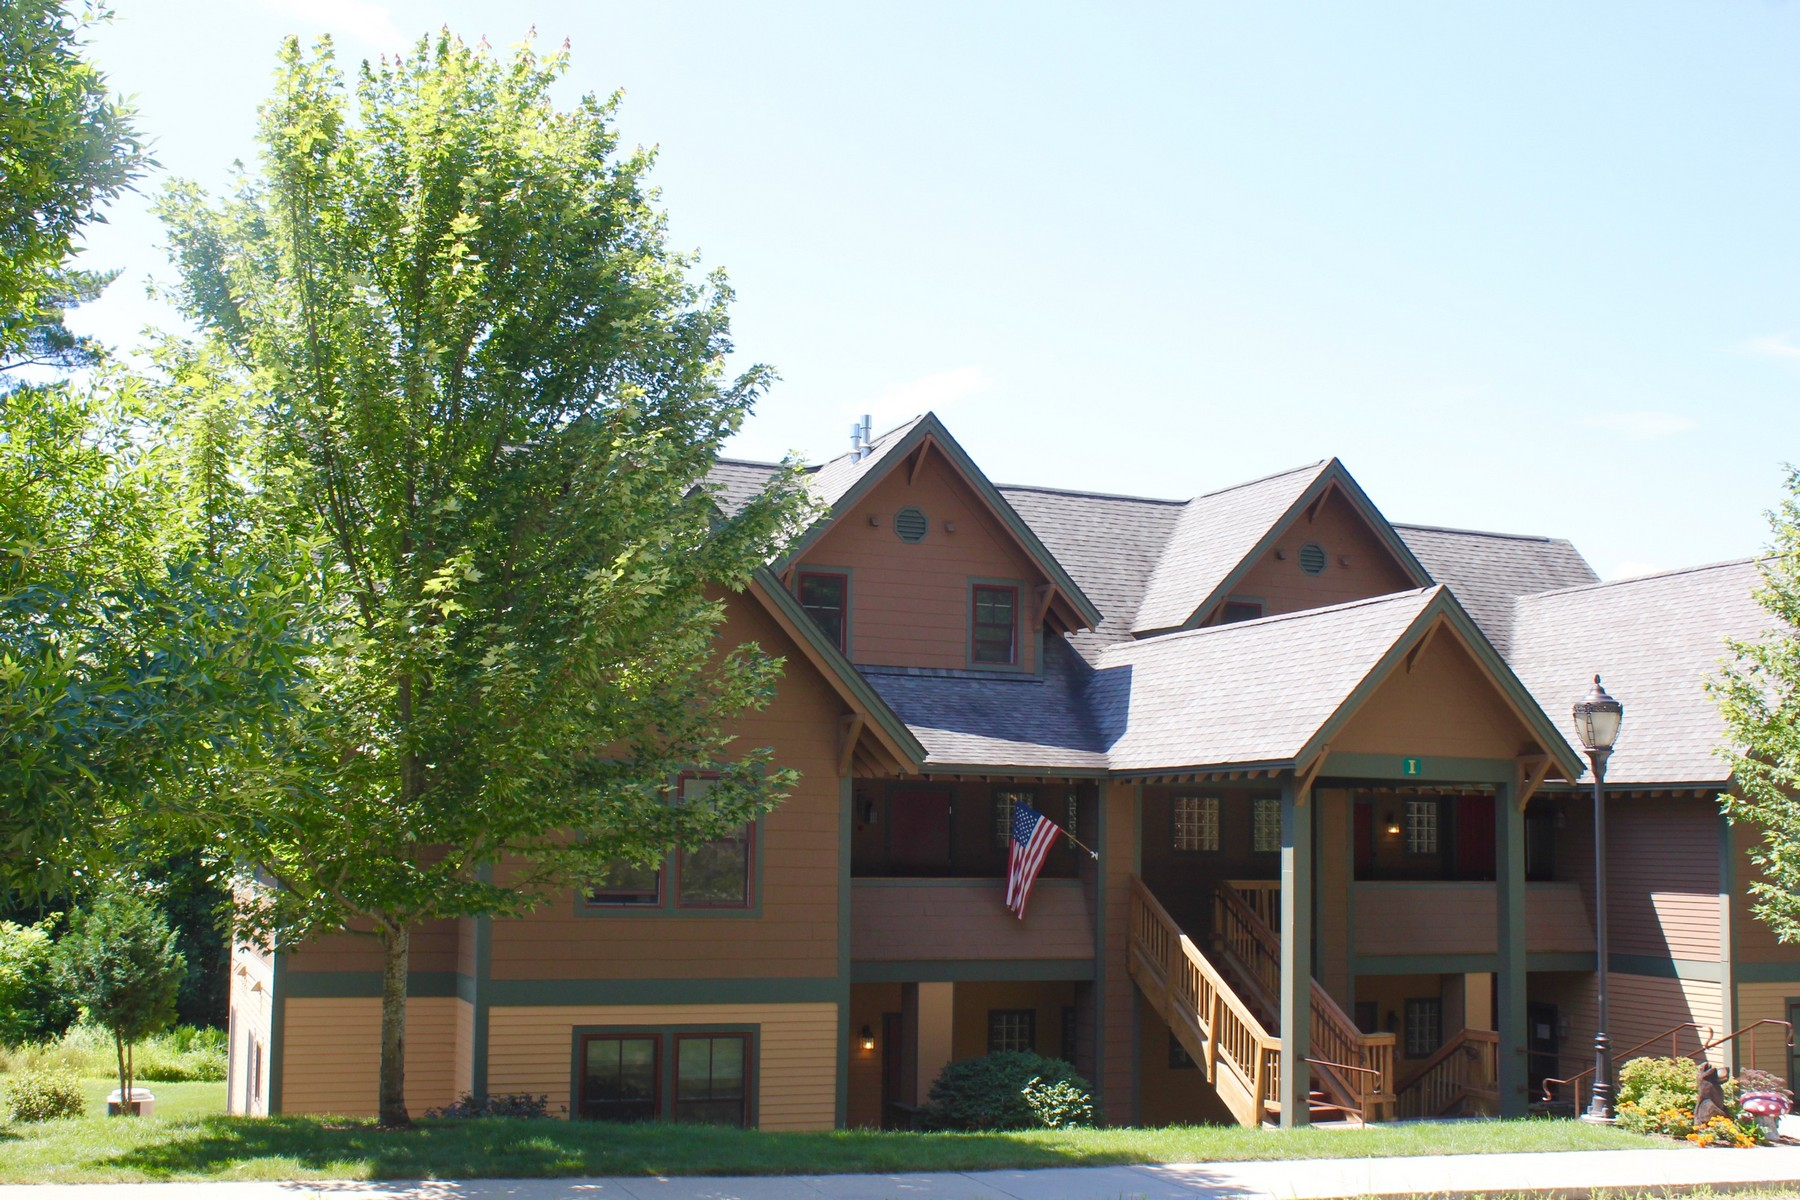 شقة بعمارة للـ Sale في Castle Hill Resort Condominium 74 Spaulding Rd I2 Cavendish, Vermont, 05153 United States